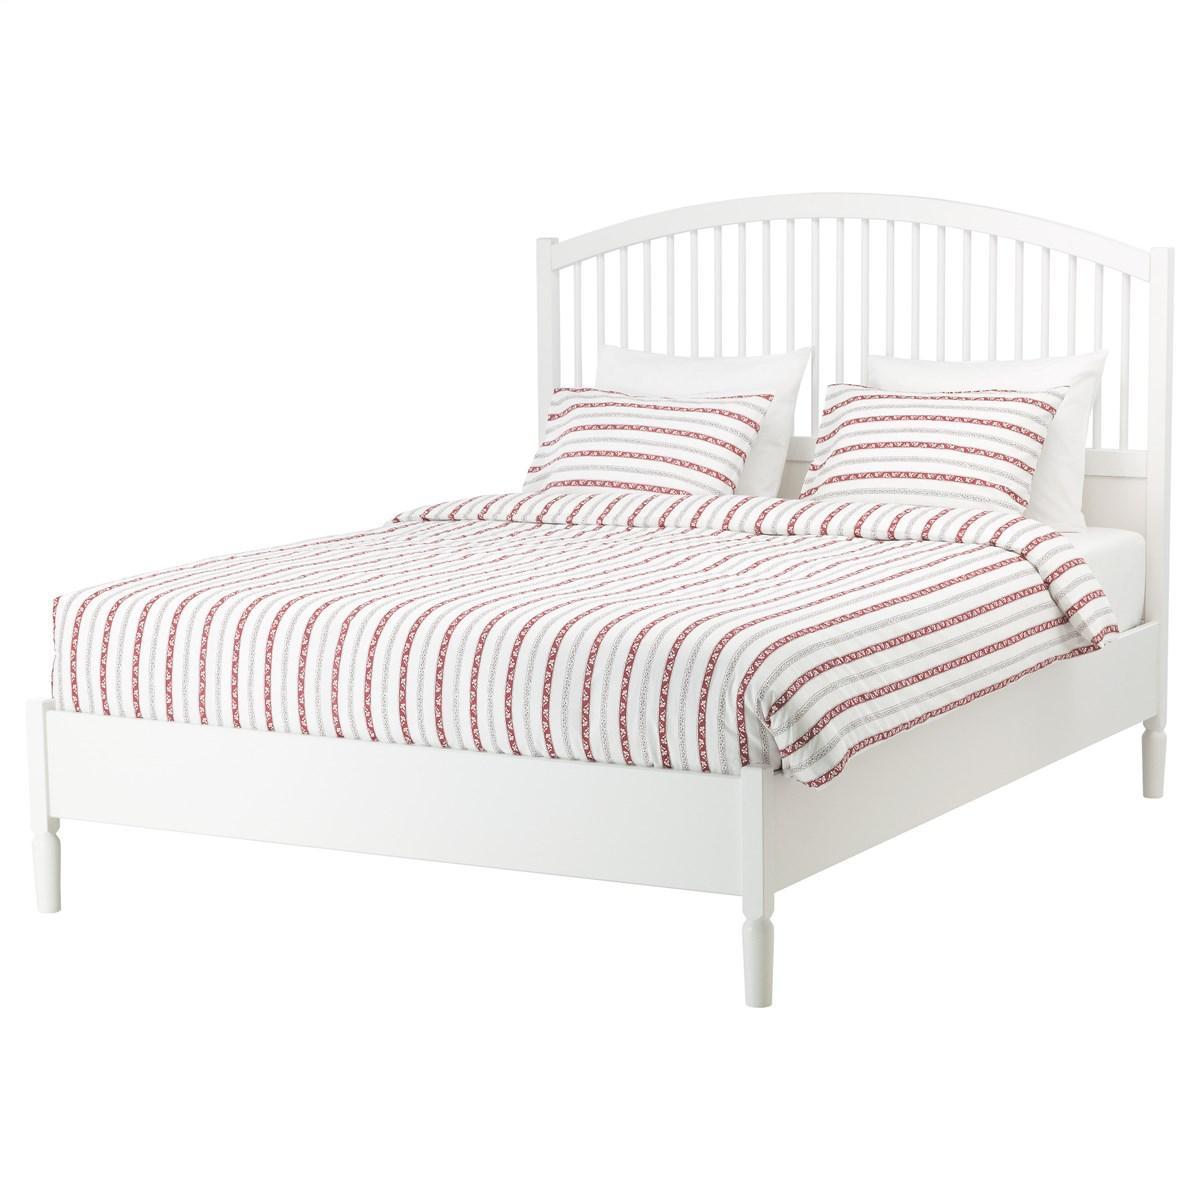 каркас кровати Ikea Tyssedal 160x200 см 59057730 купить в киеве